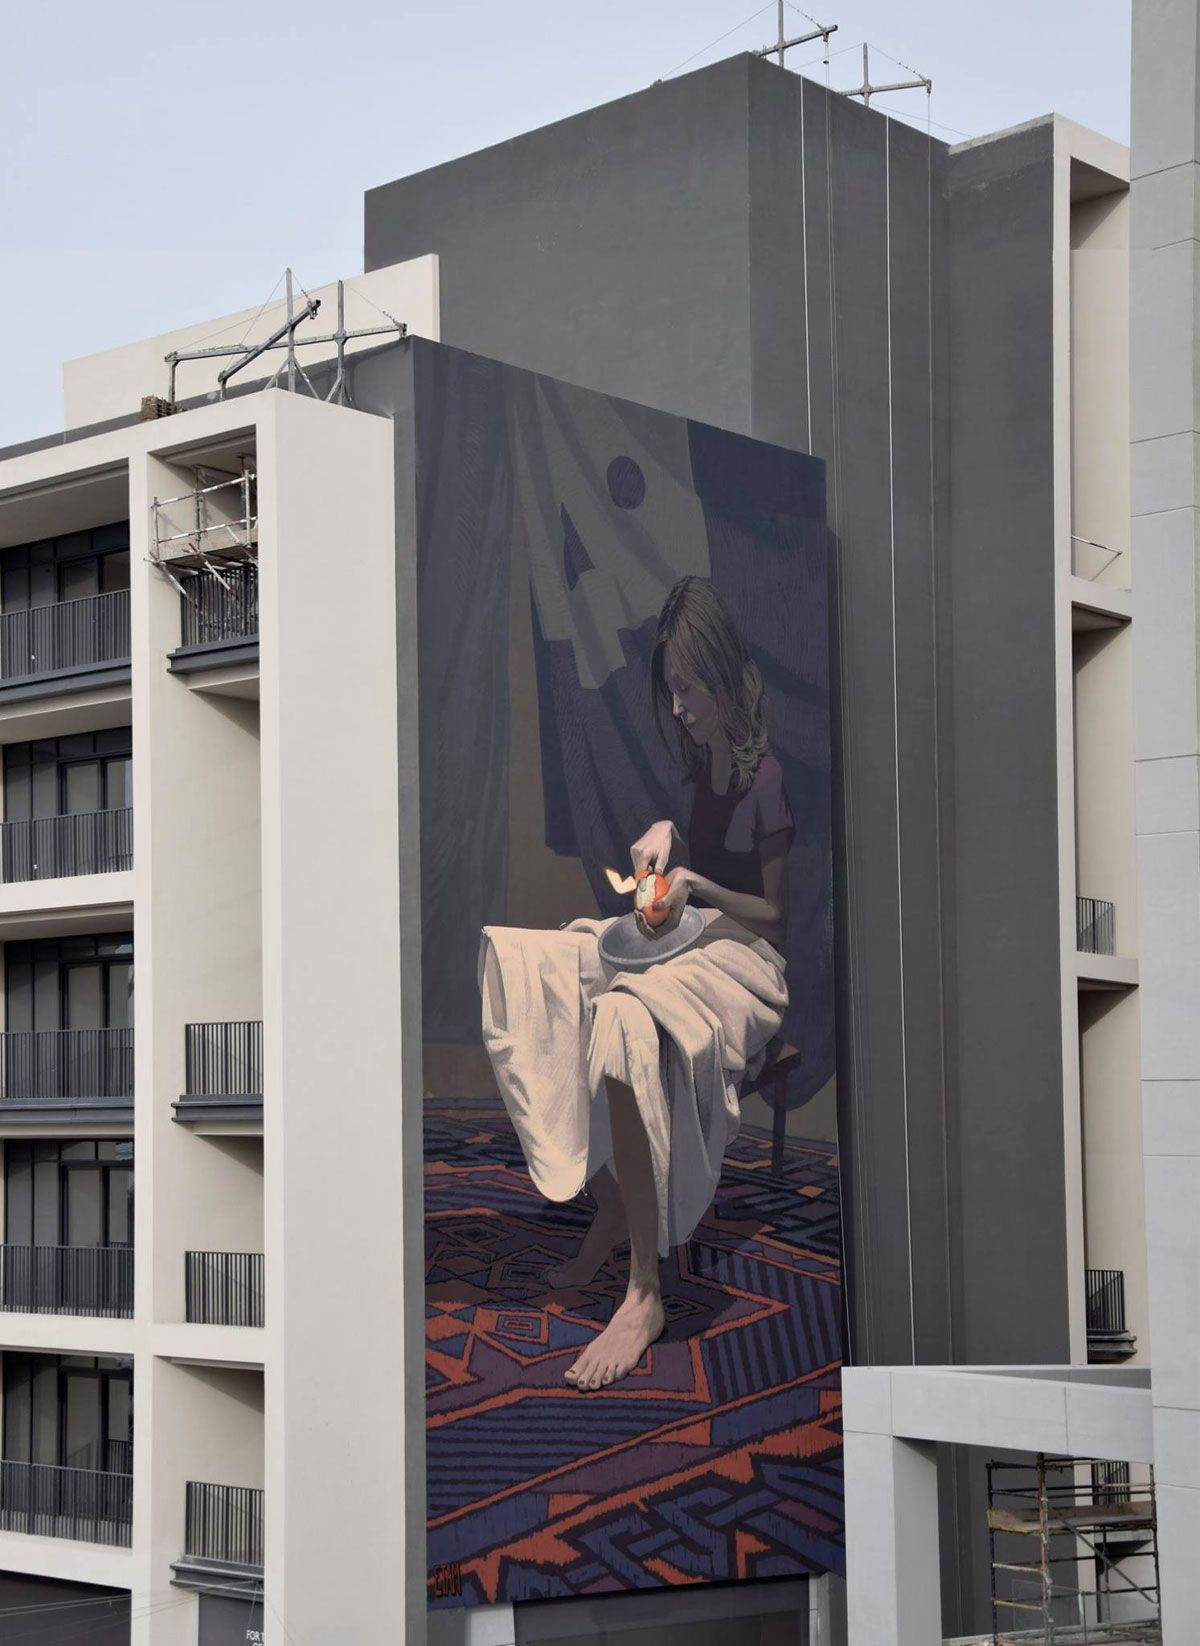 Graffiti wall uae - Etam Cru Girl With The Orange Mural Painted For Dubai Walls Initiative In Dubai Uae